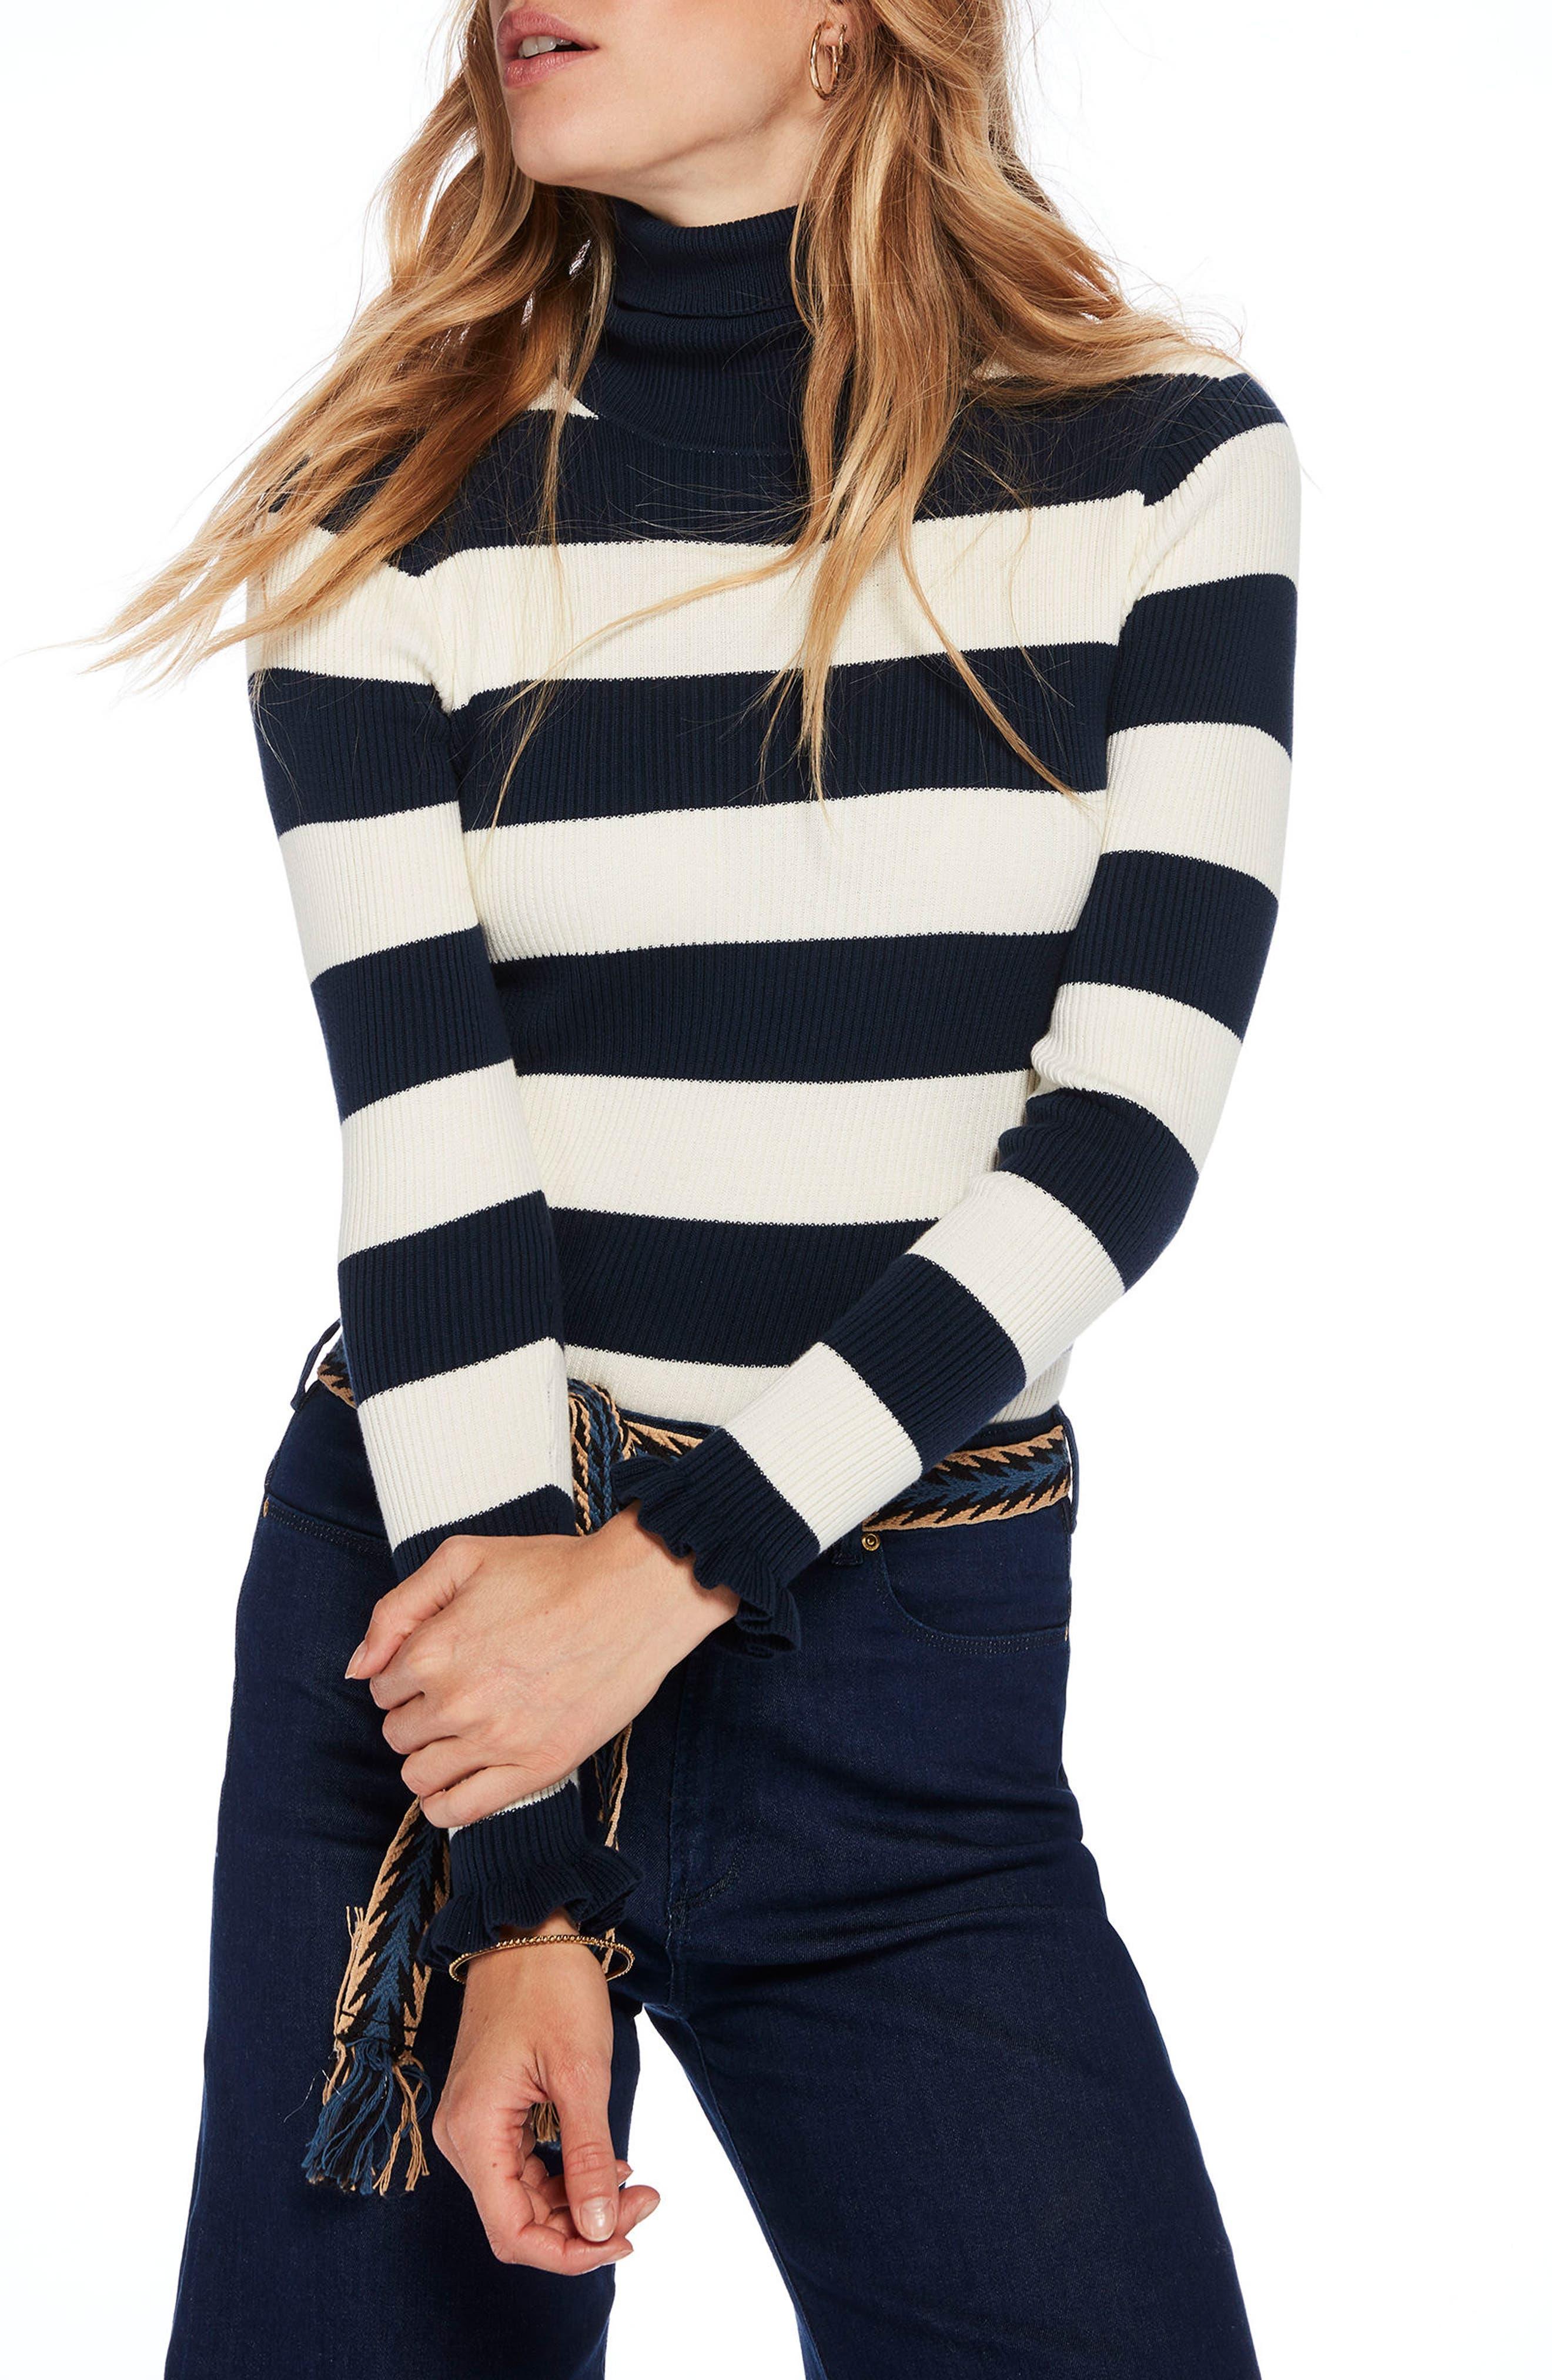 Stripe Turtleneck,                         Main,                         color, Navy/ Off White Thick Stripe